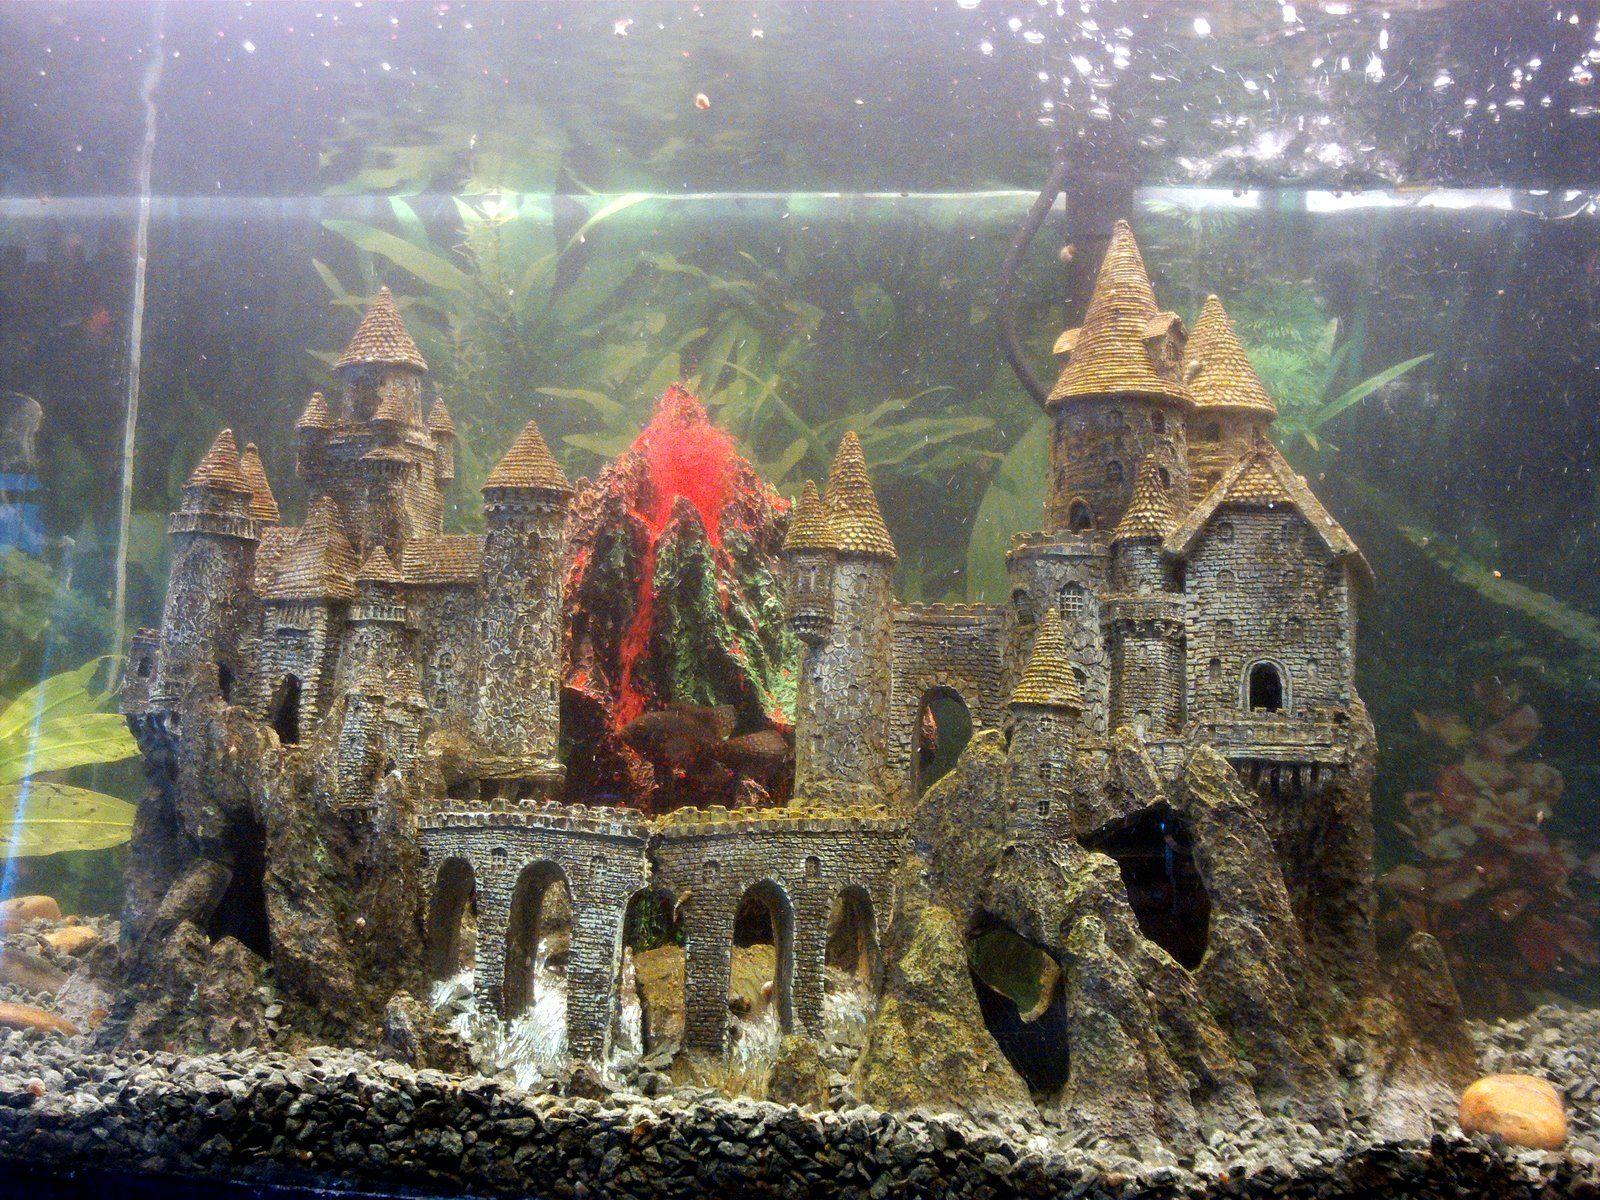 Fish tank aquarium castle hill - Aquarium Decoration Ideas Flooded Tower Volcano Making Idea Itself